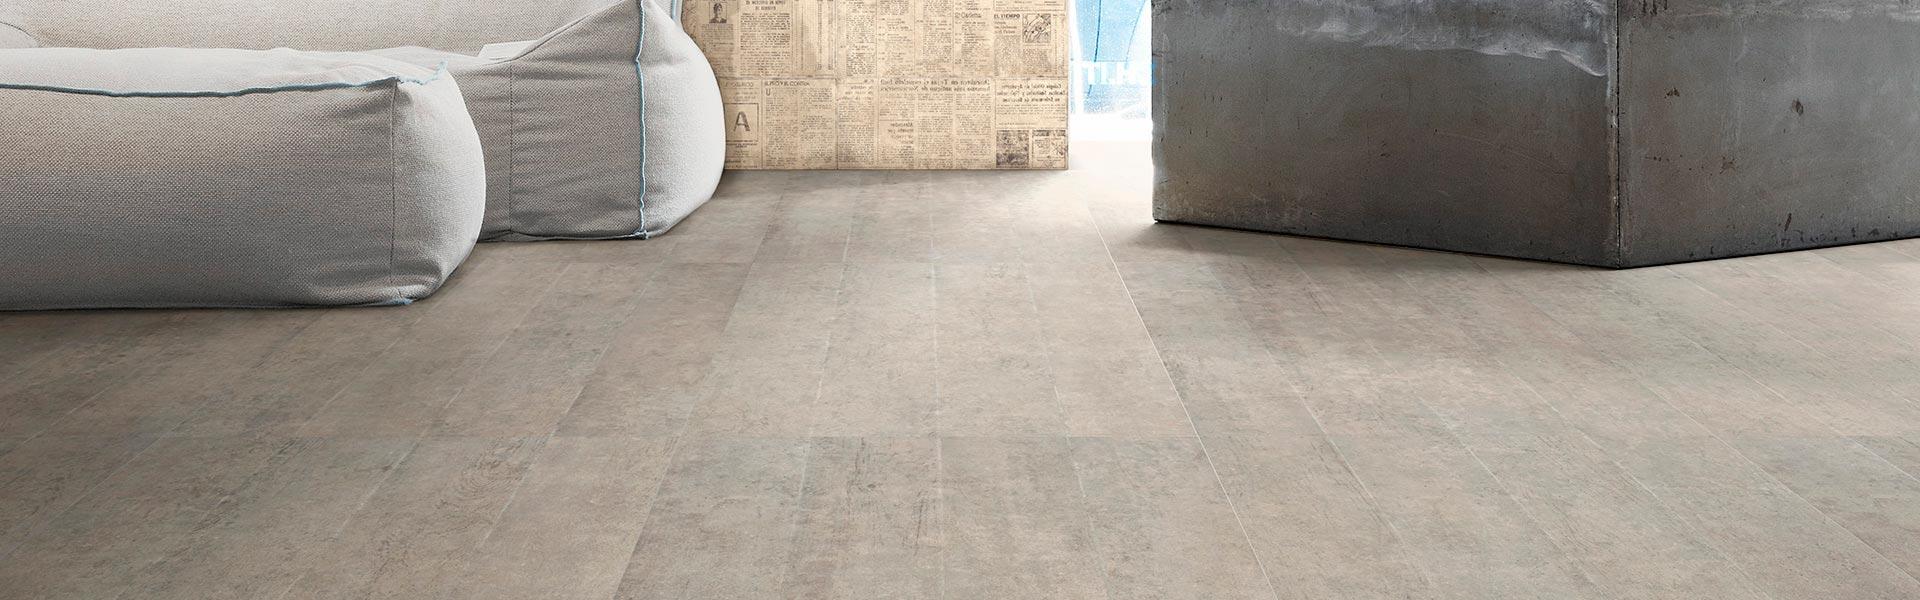 Vives floor tiles porcelain bunker 293x593 bunker porcelain floor tiles by vives azulejos y gres sa dailygadgetfo Image collections